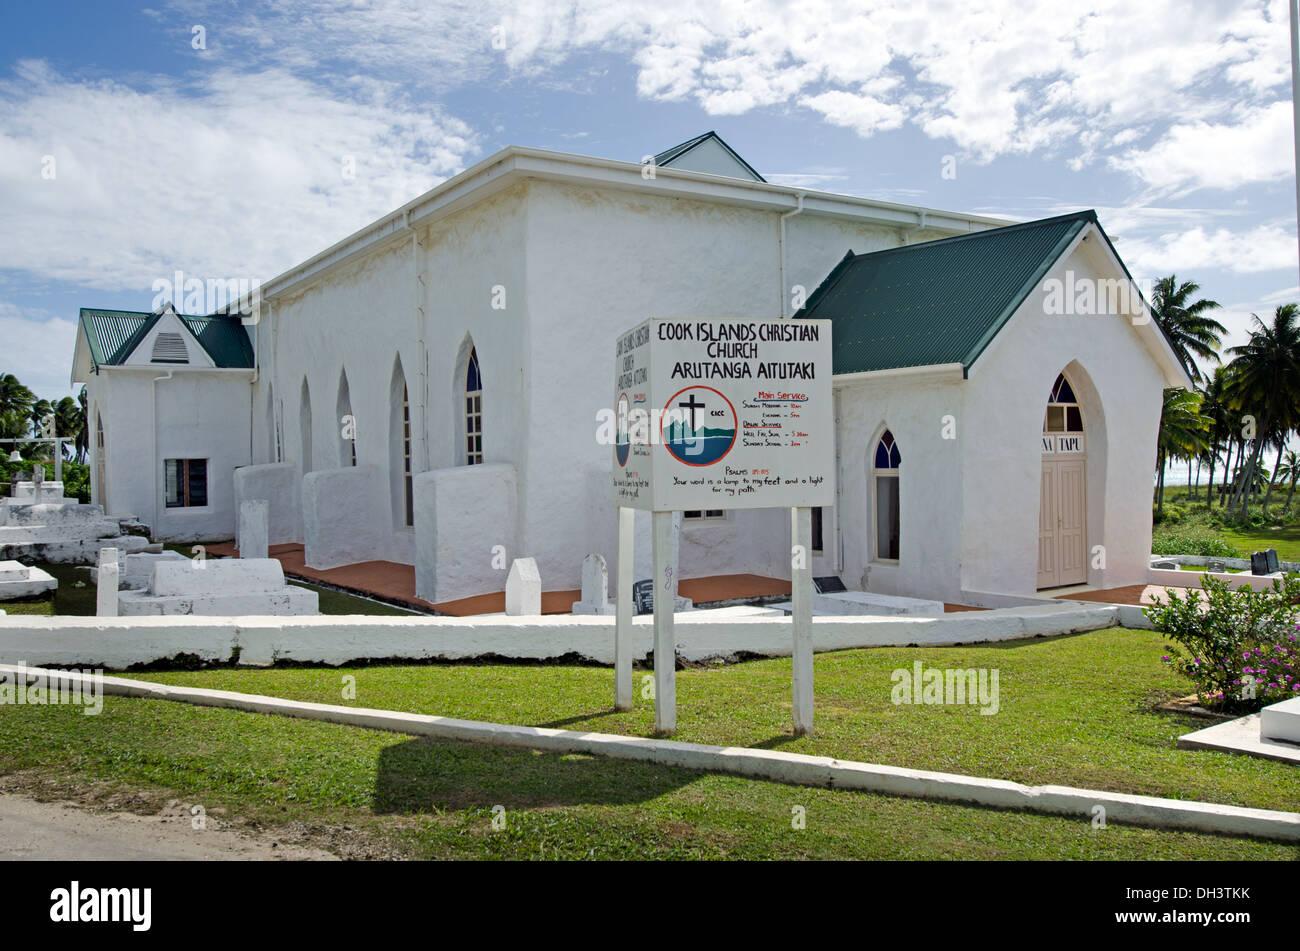 Aitutaki Cook Islands Christian Church (CICC) - Stock Image